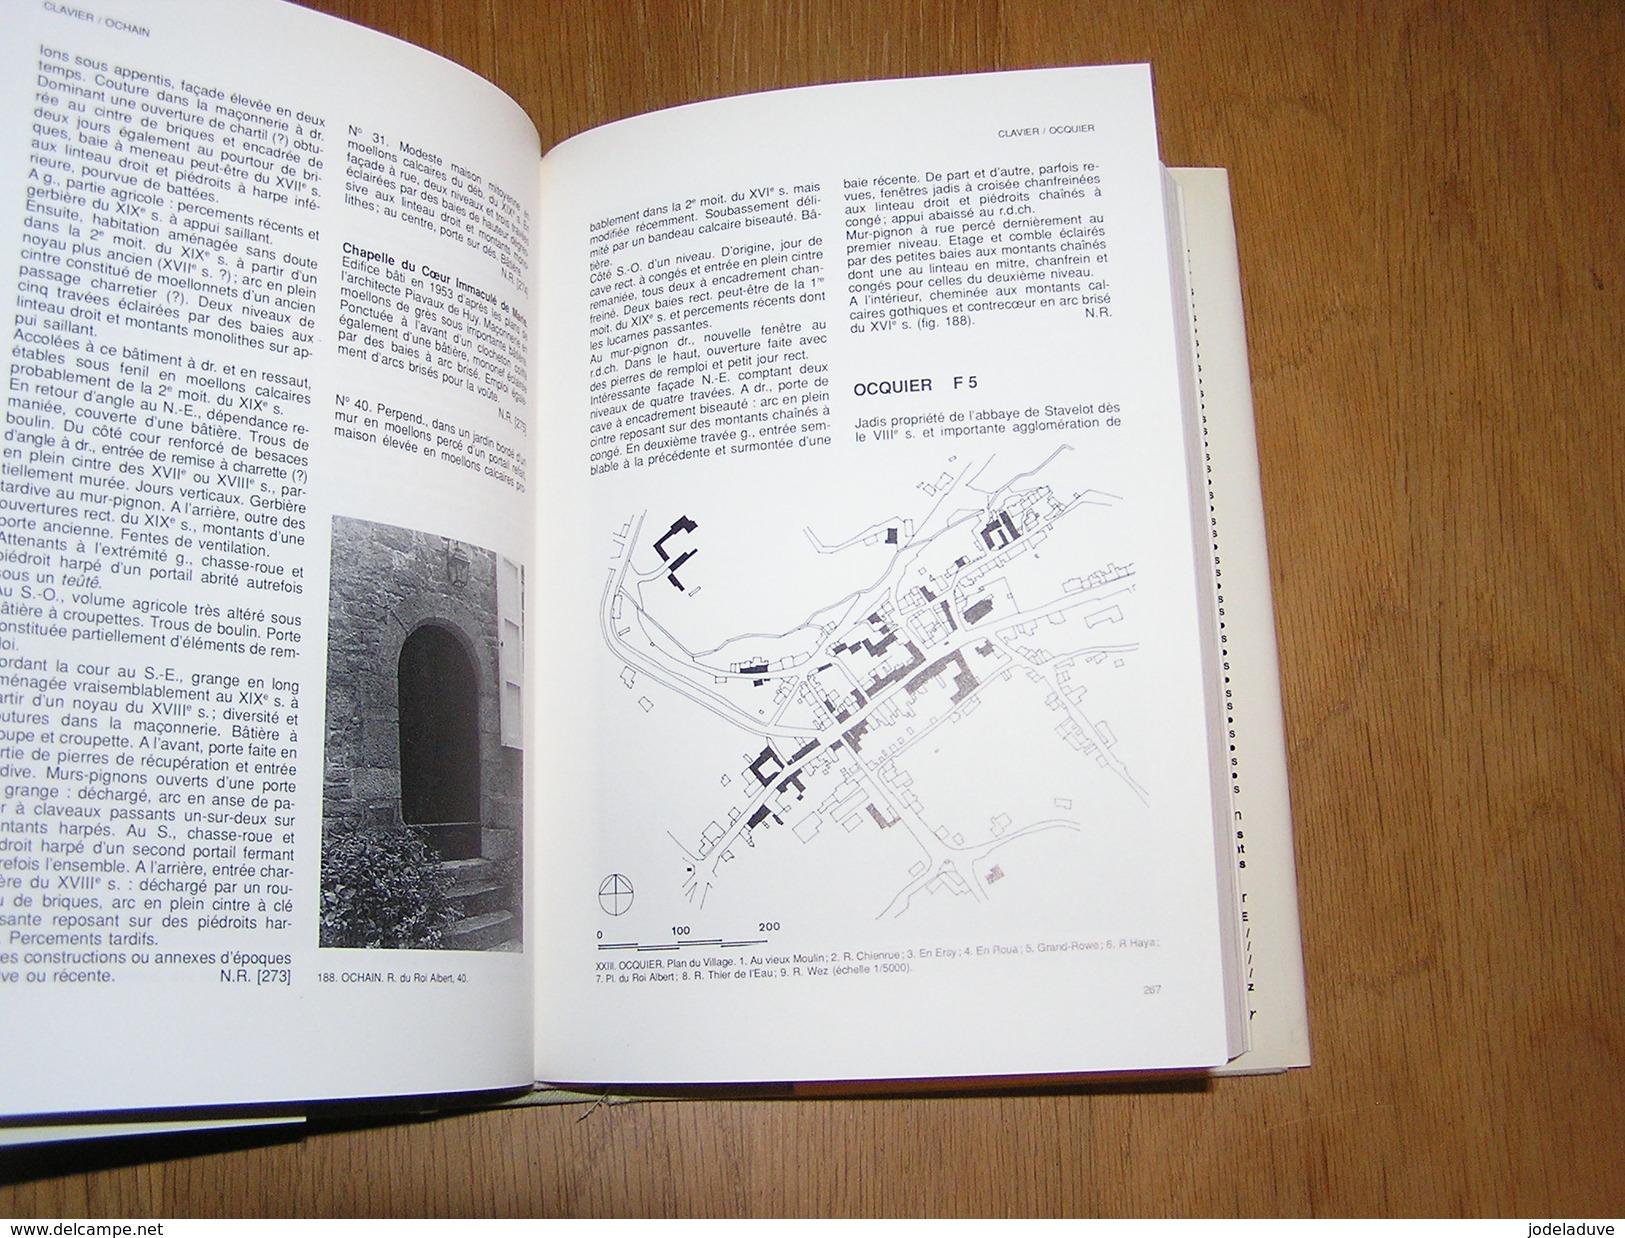 PATRIMOINE MONUMENTAL BELGIQUE 16 / 1 Huy Régionalisme Clavier Ocquier Amay Anthisnes Burdinne Tavier Hamoir Engis Heron - Belgium